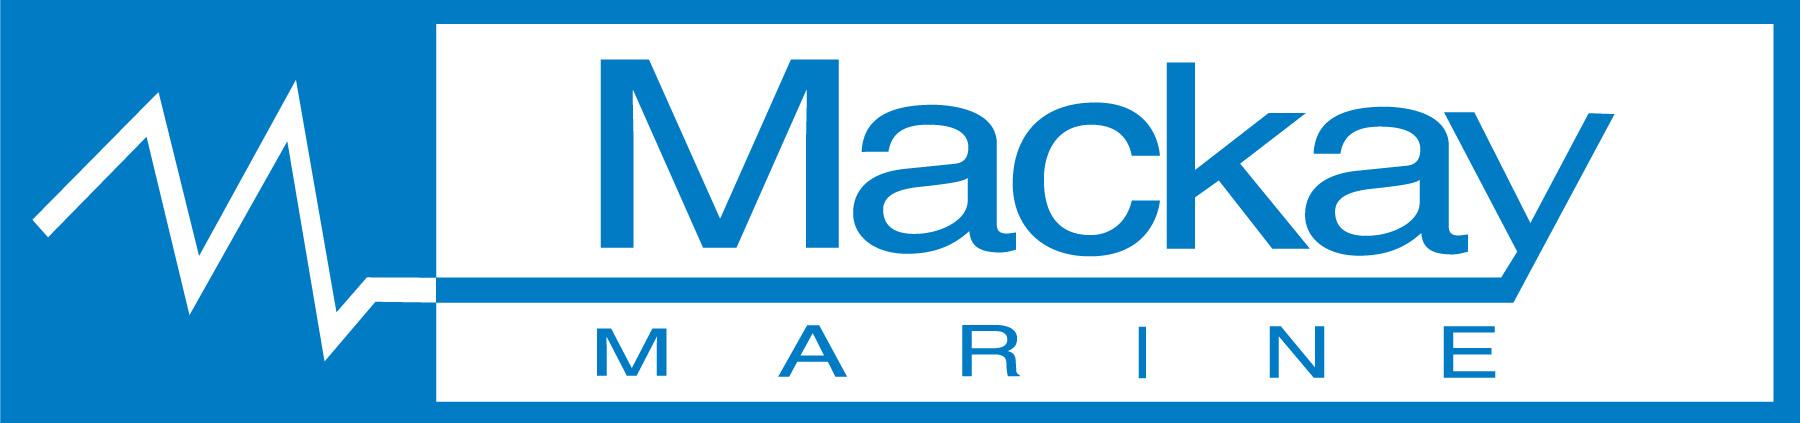 MackayMarine+web PMS300